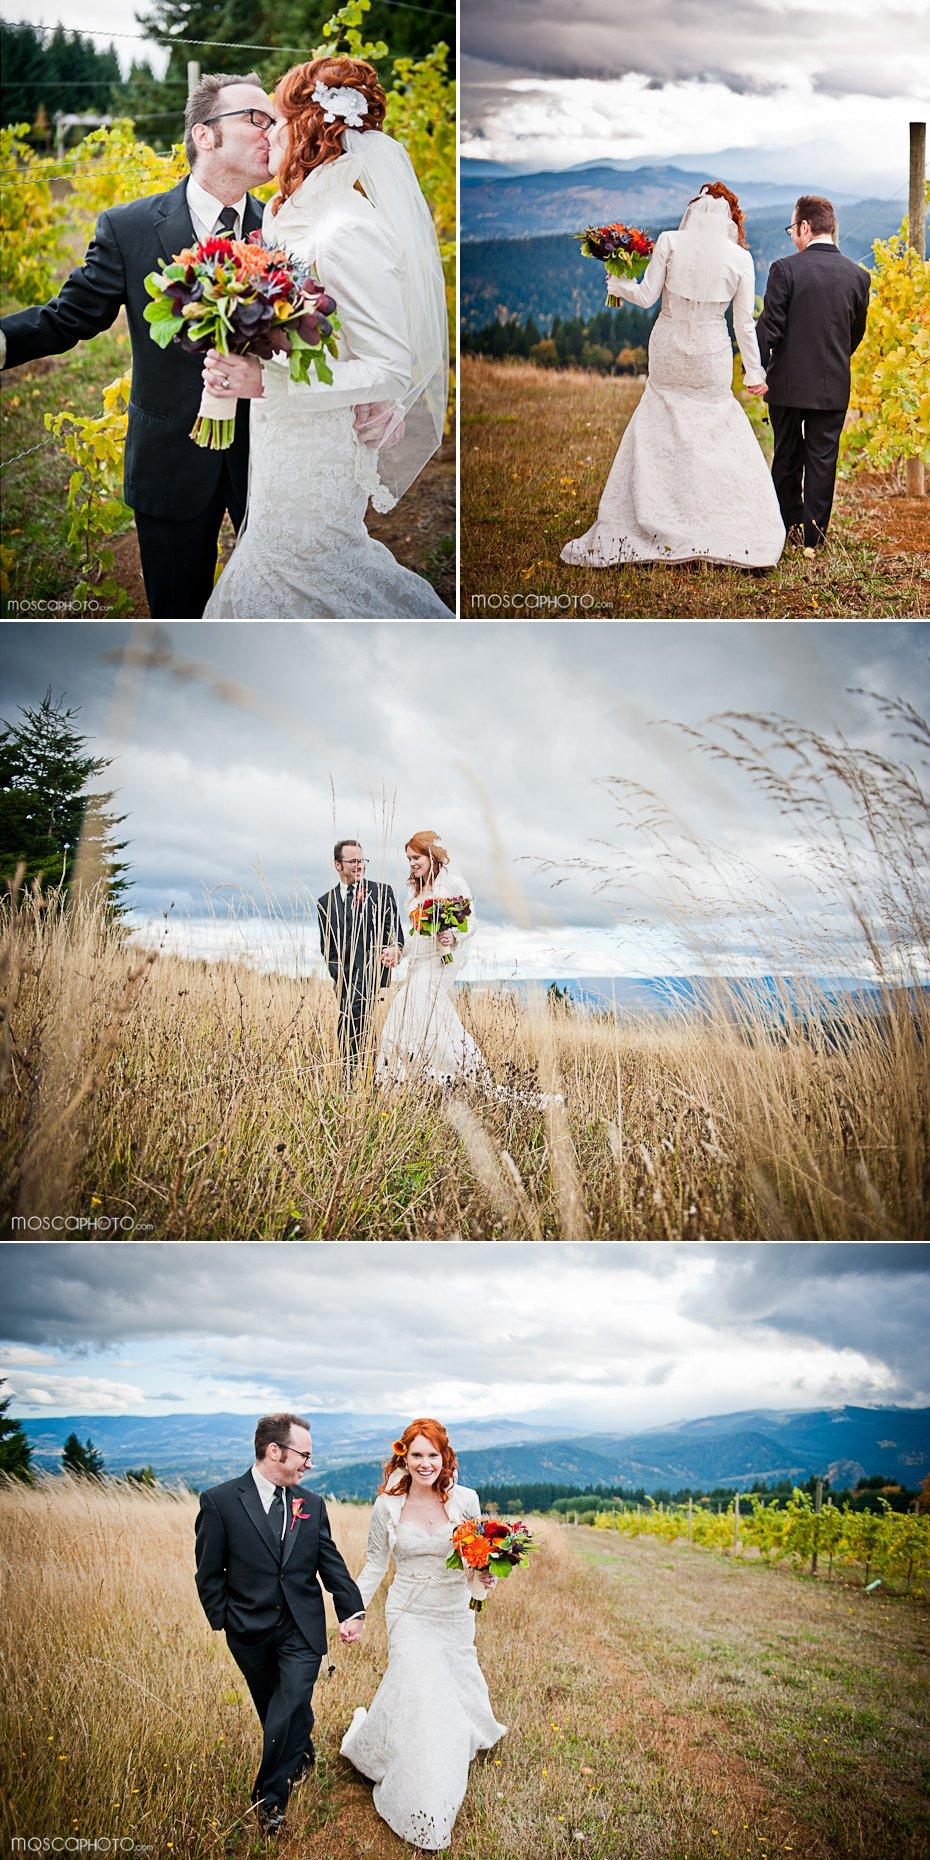 Bride-groom-fall-wedding-ivory-wedding-dress-lace-outdoor-ceremony.full